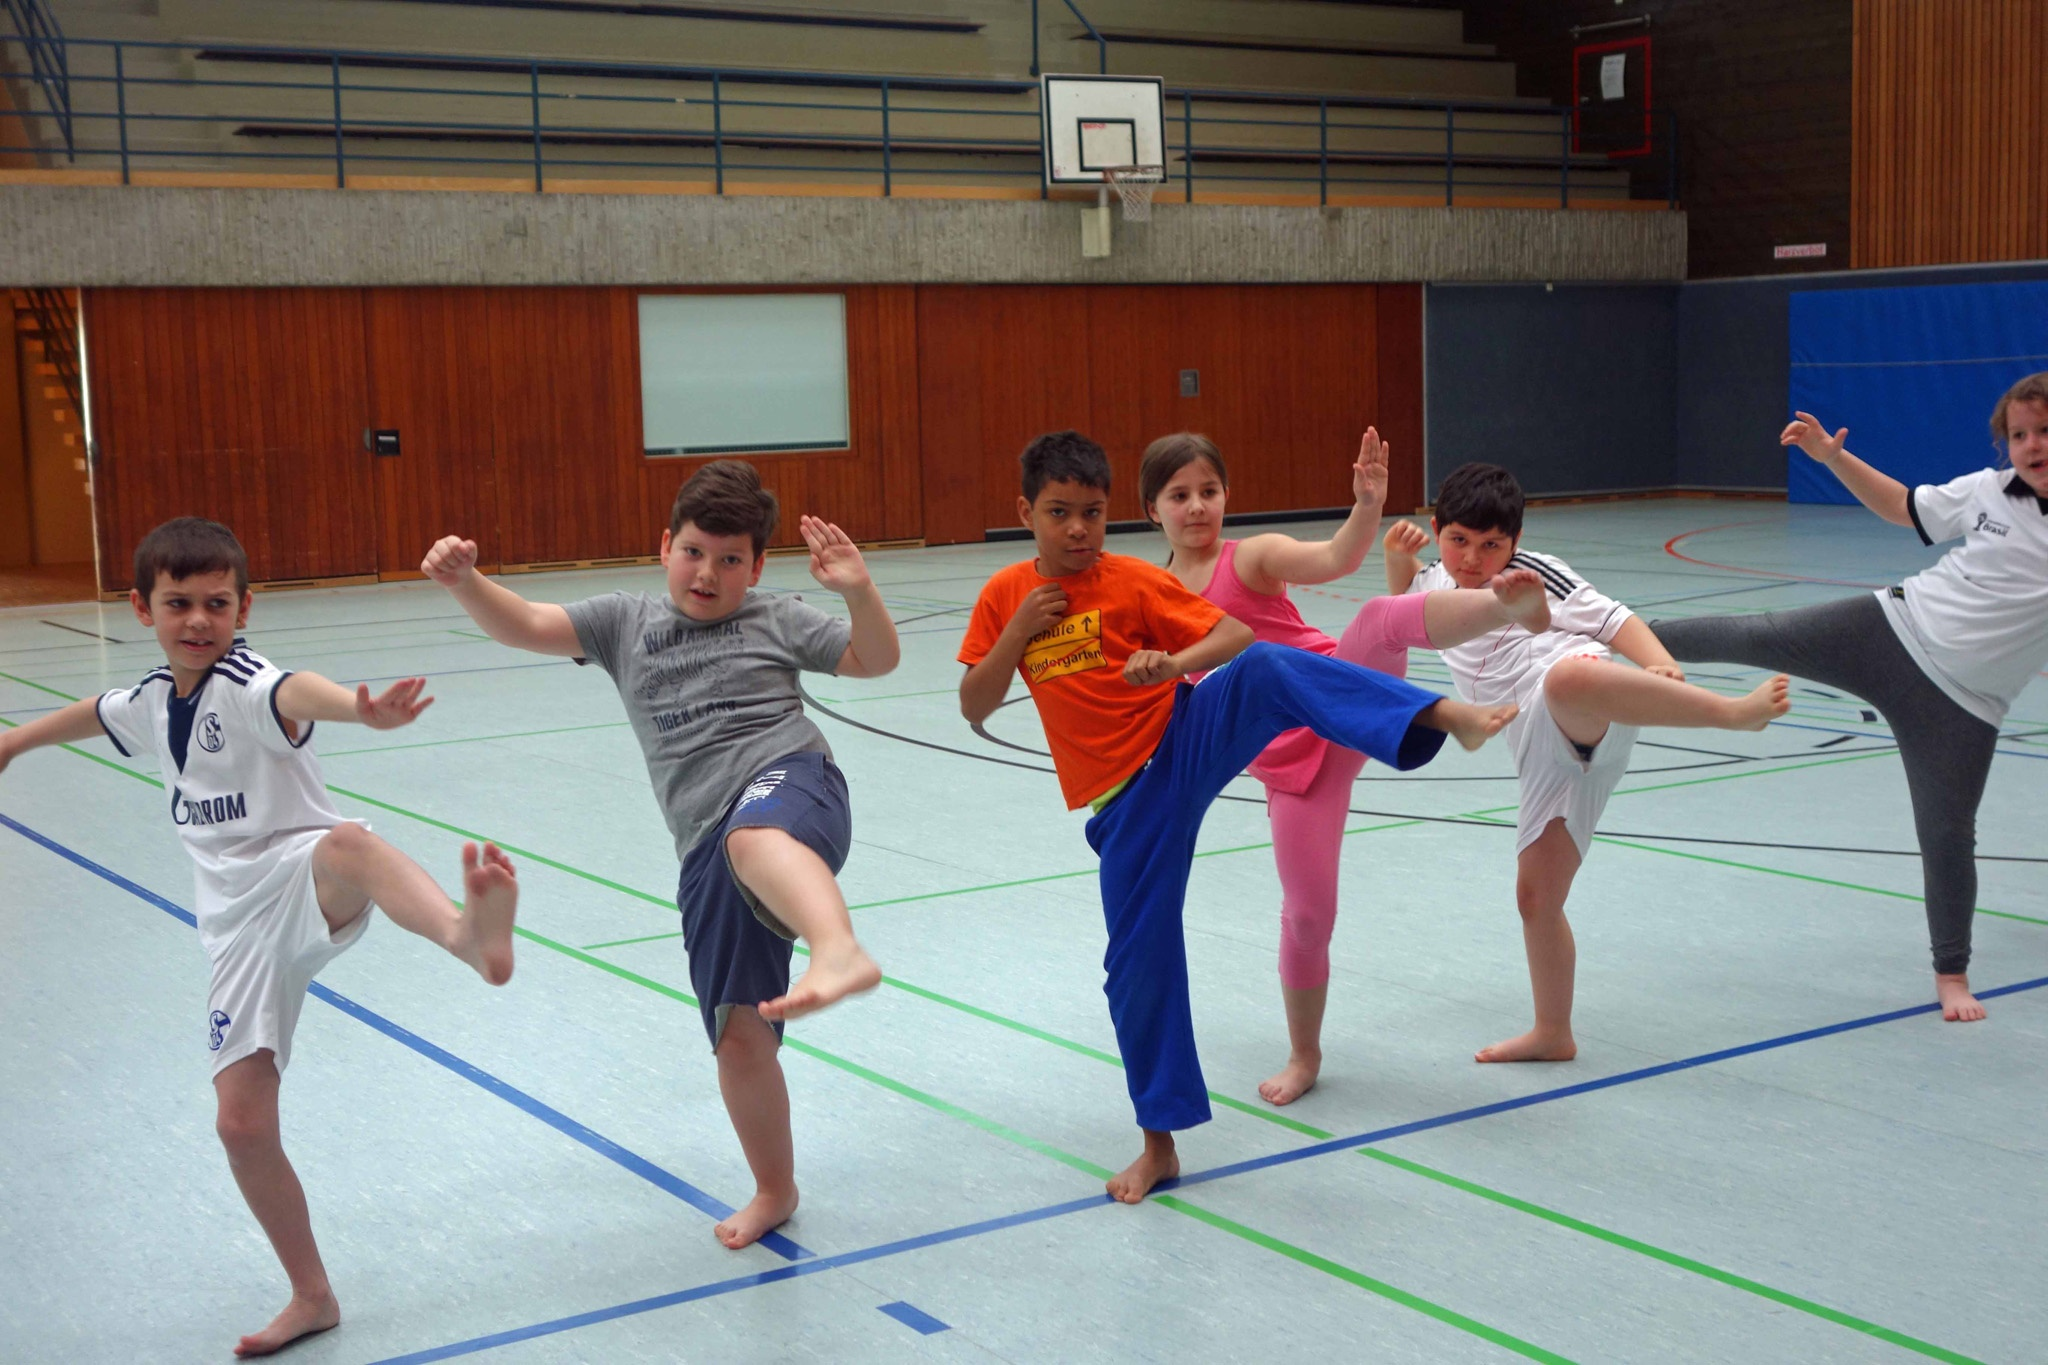 Baerenfelsschule2-2048px